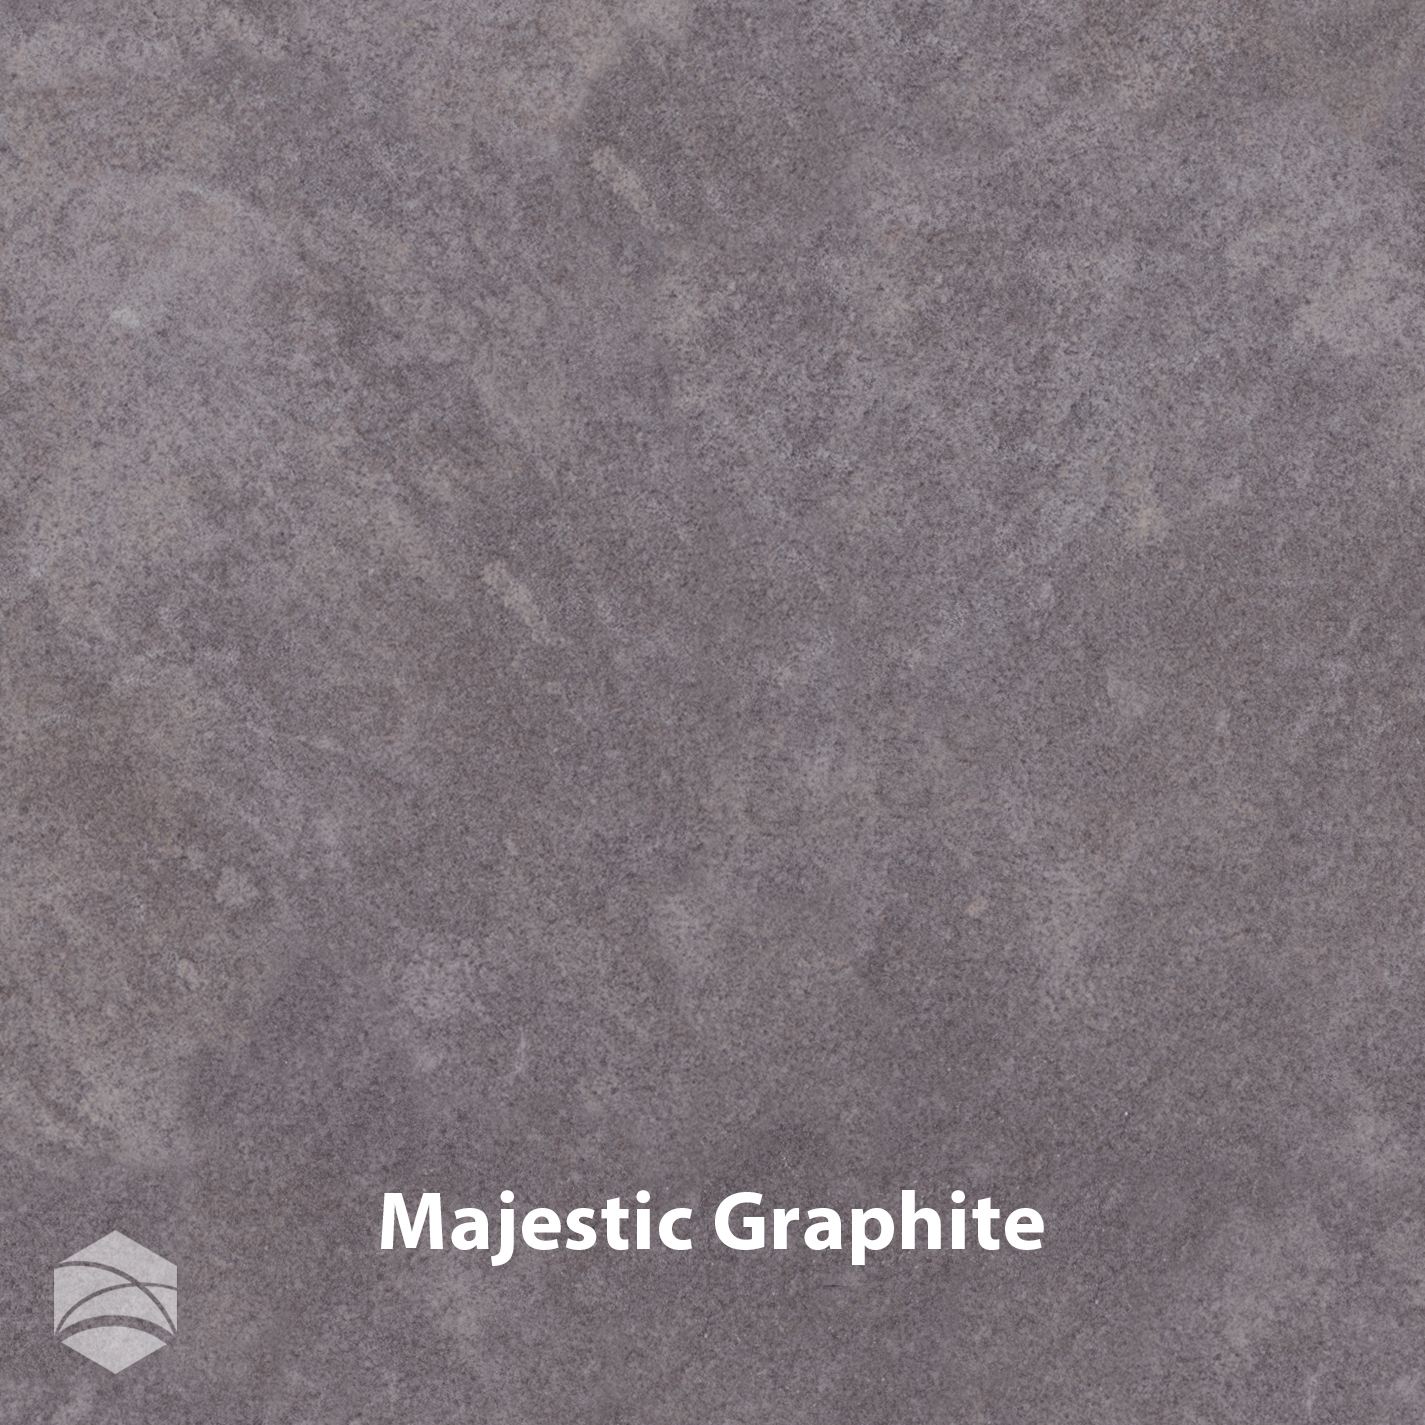 Majestic Graphite_V2_14x14.jpg